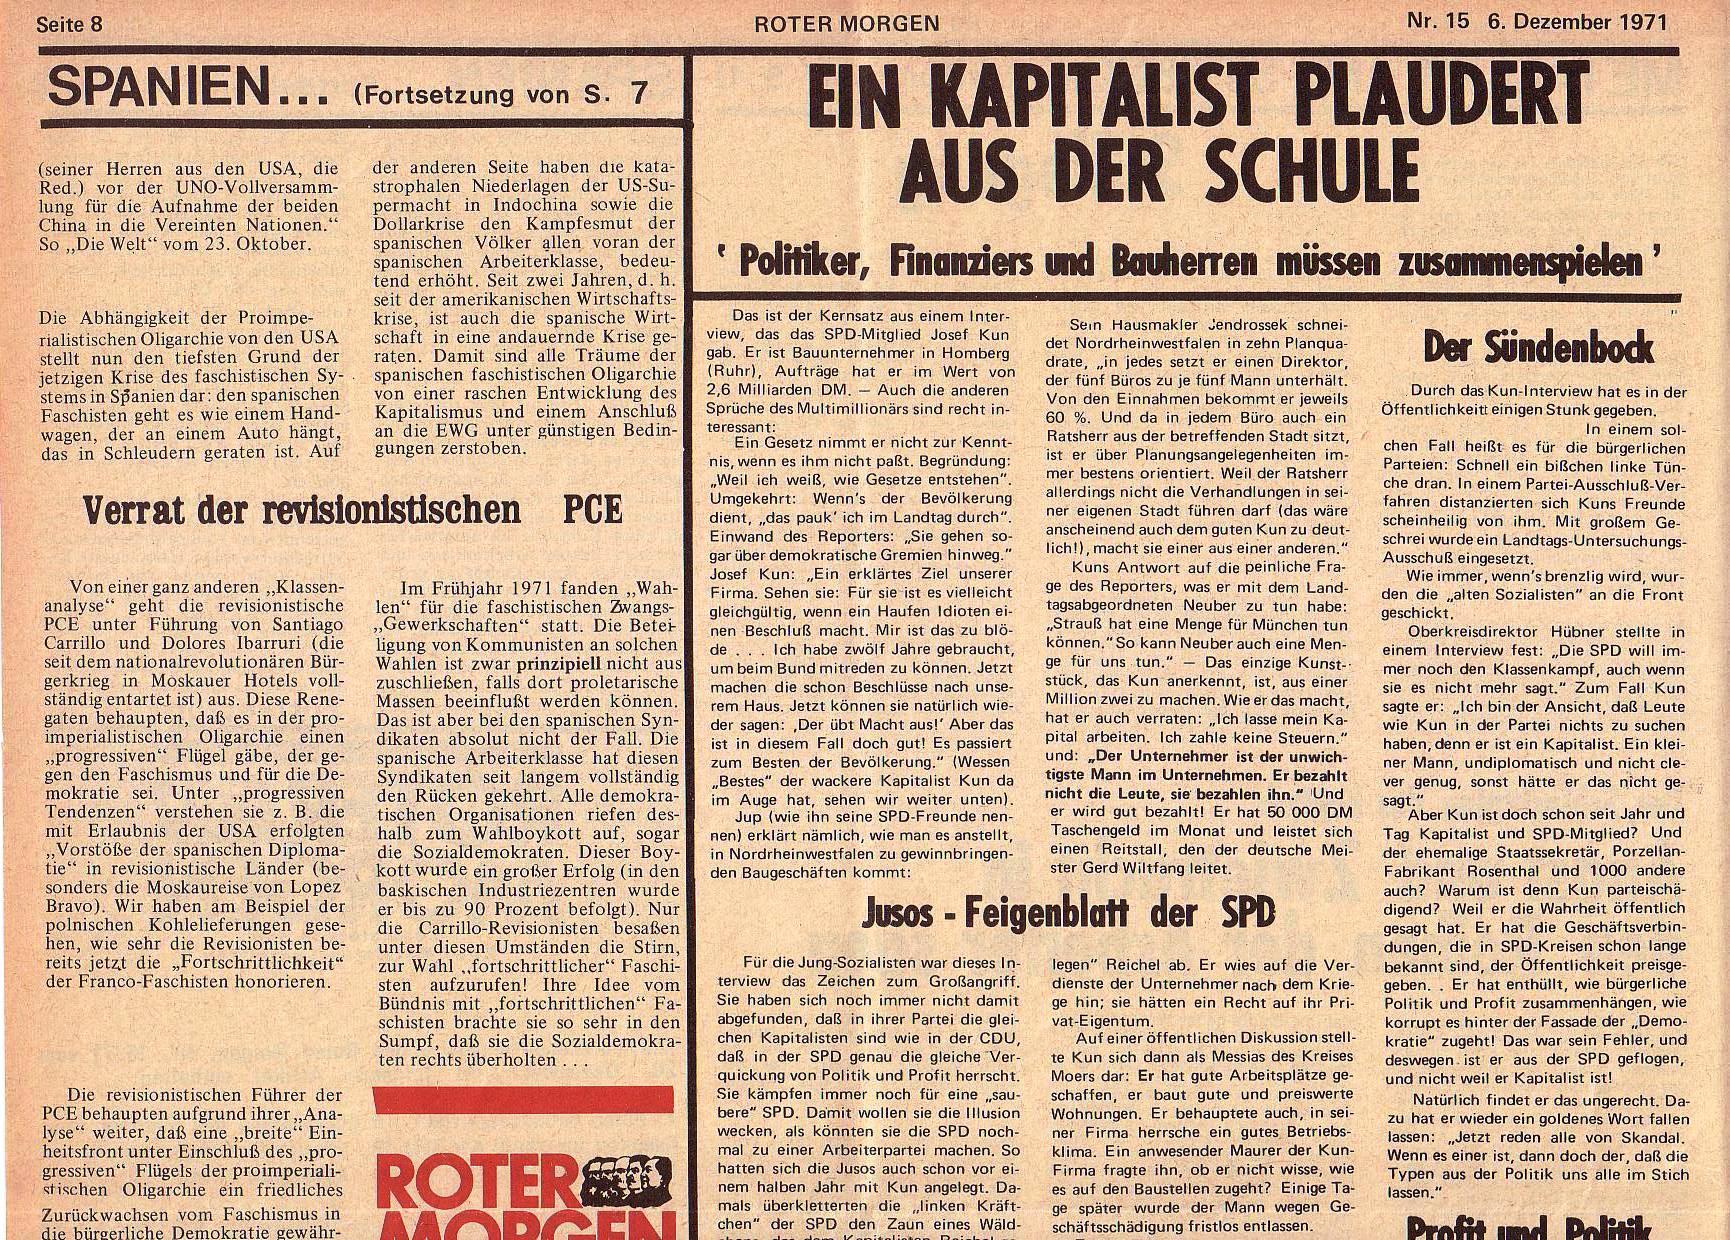 Roter Morgen, 5. Jg., 6. Dezember 1971, Nr. 15, Seite 8a